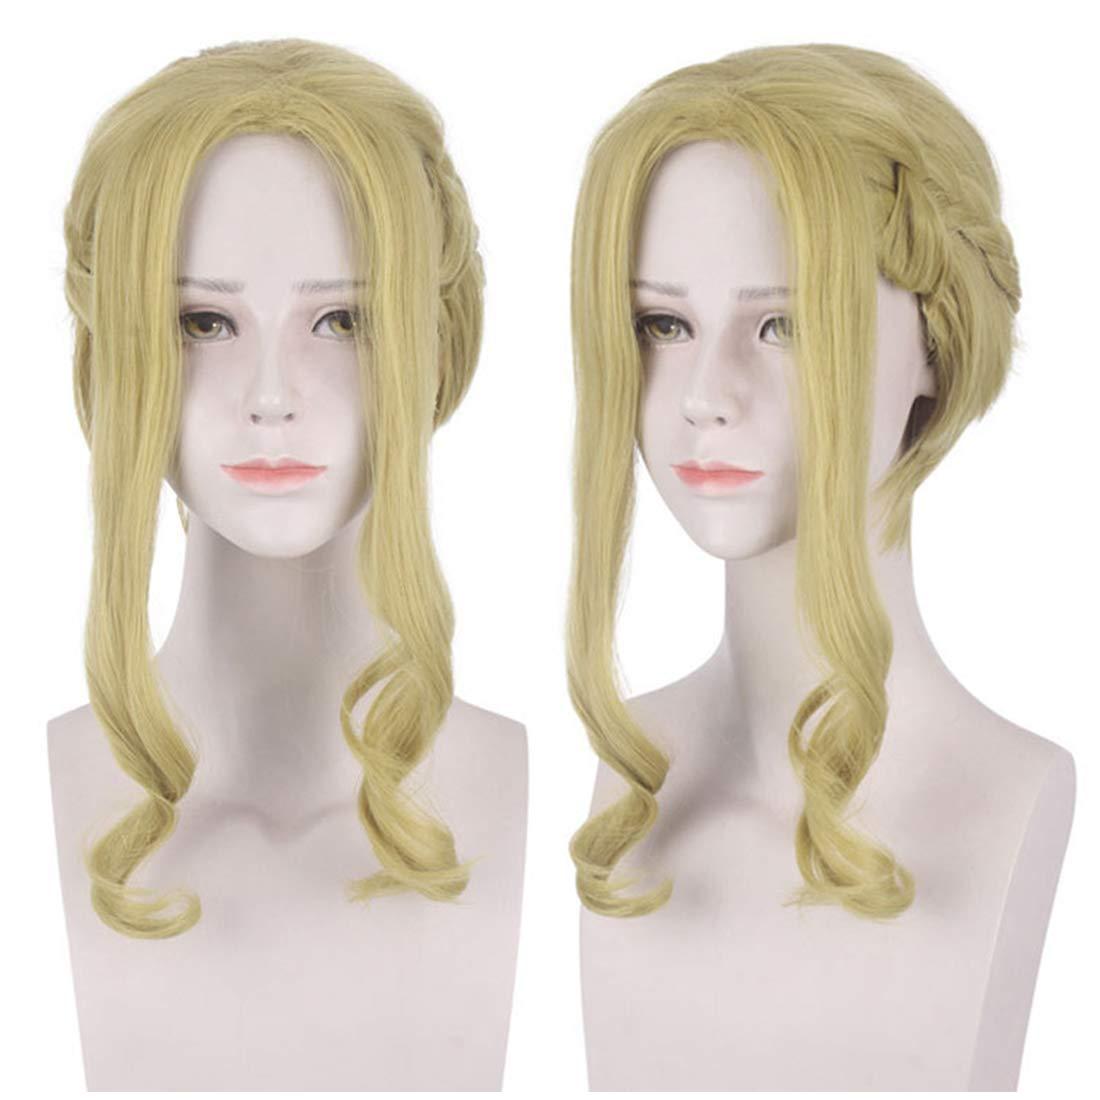 JoneTing Black Cosplay Synthetic Short Straight Wigs Hair for Men